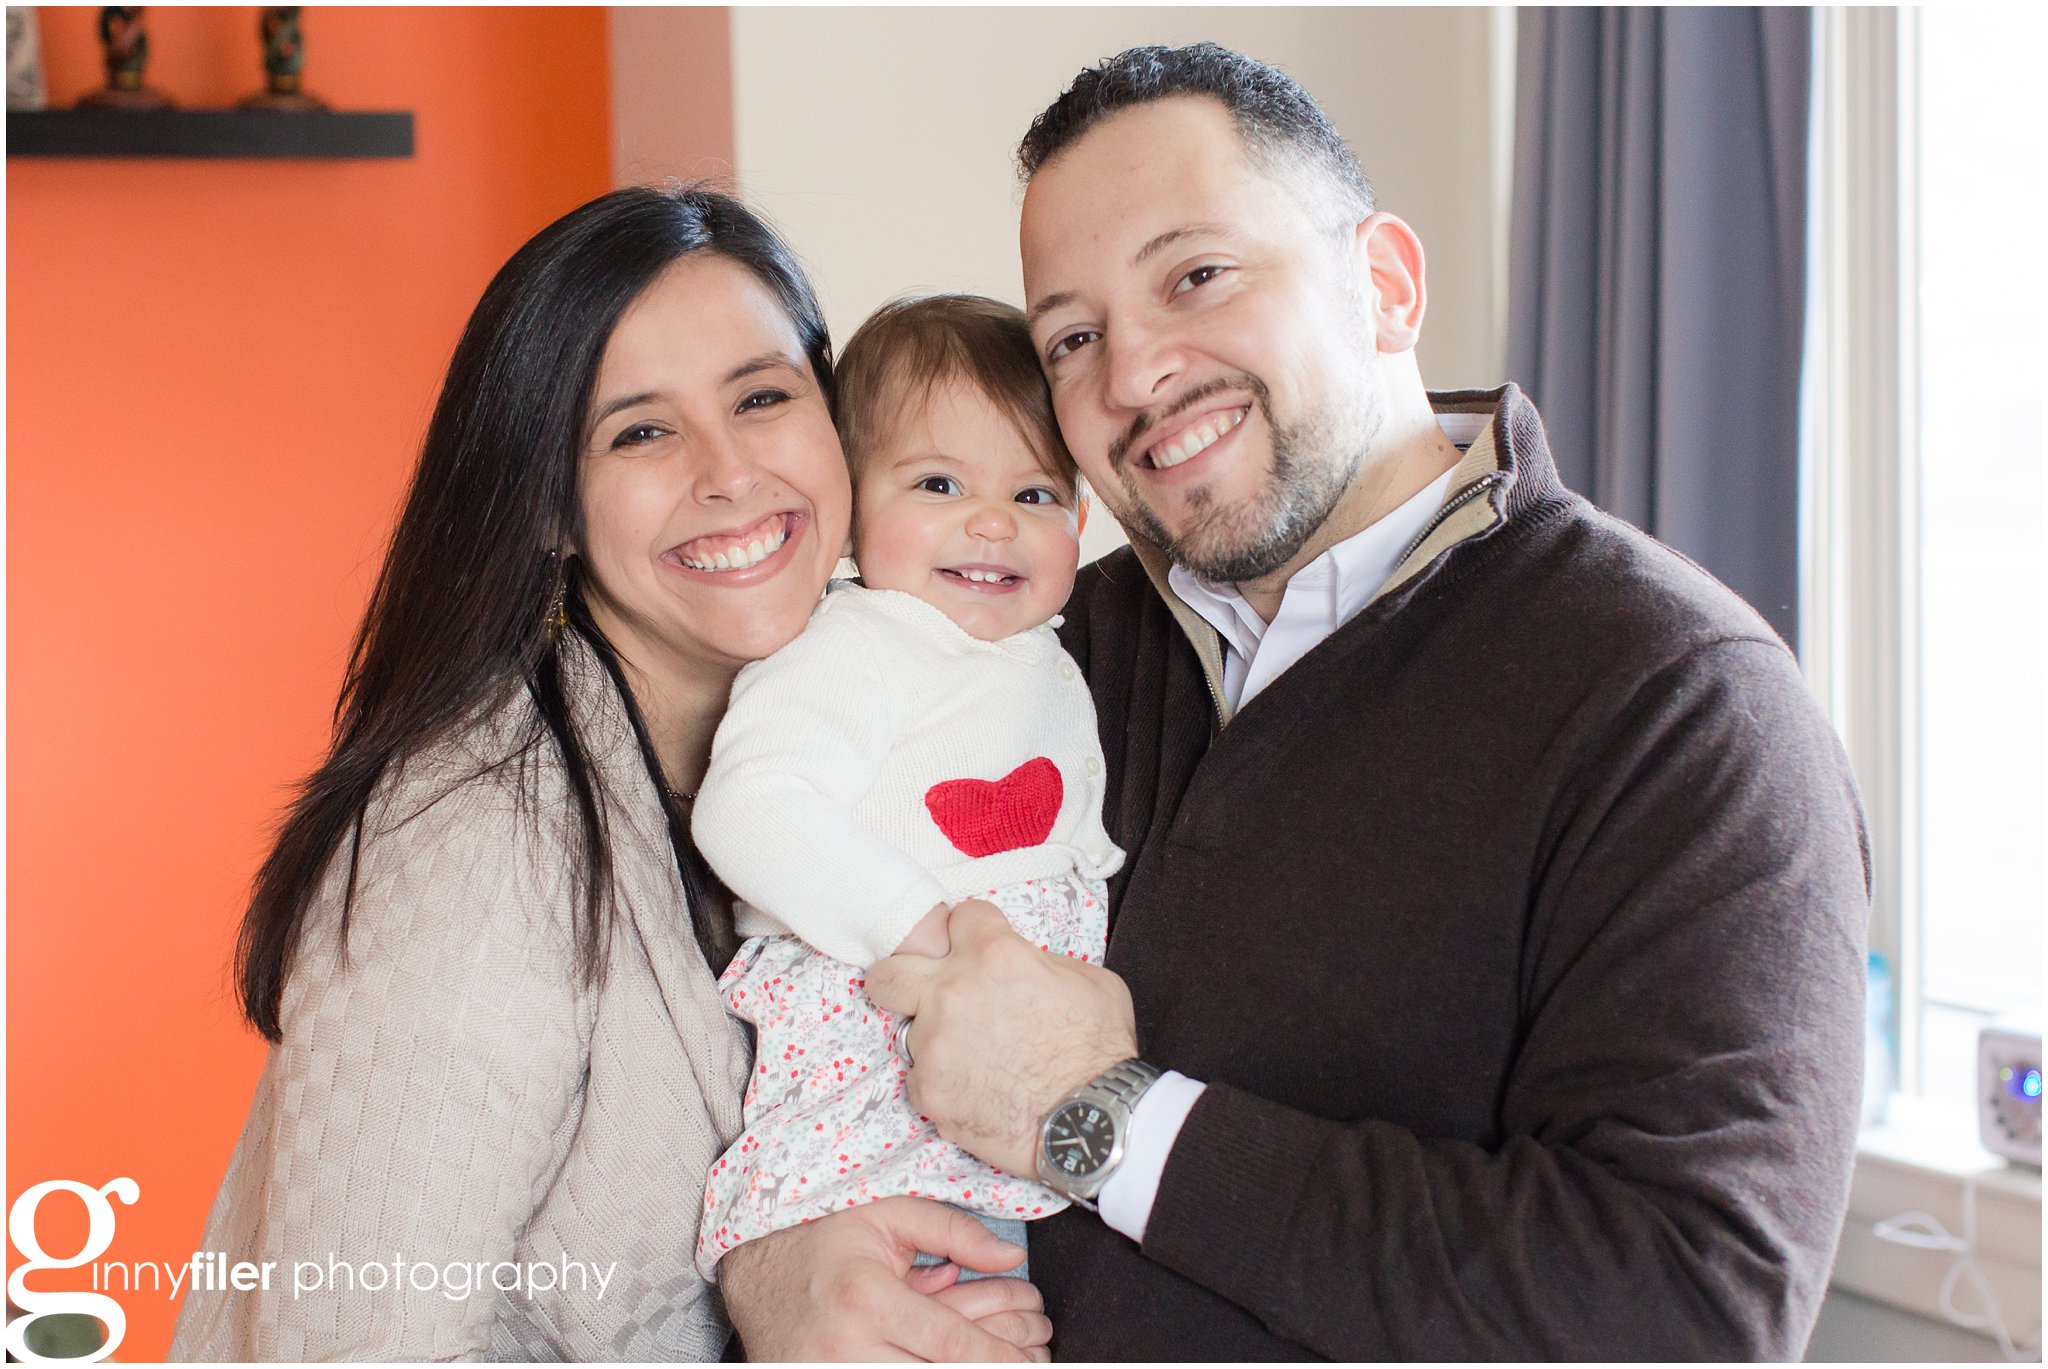 family_photography_Sanchez_0026.jpg